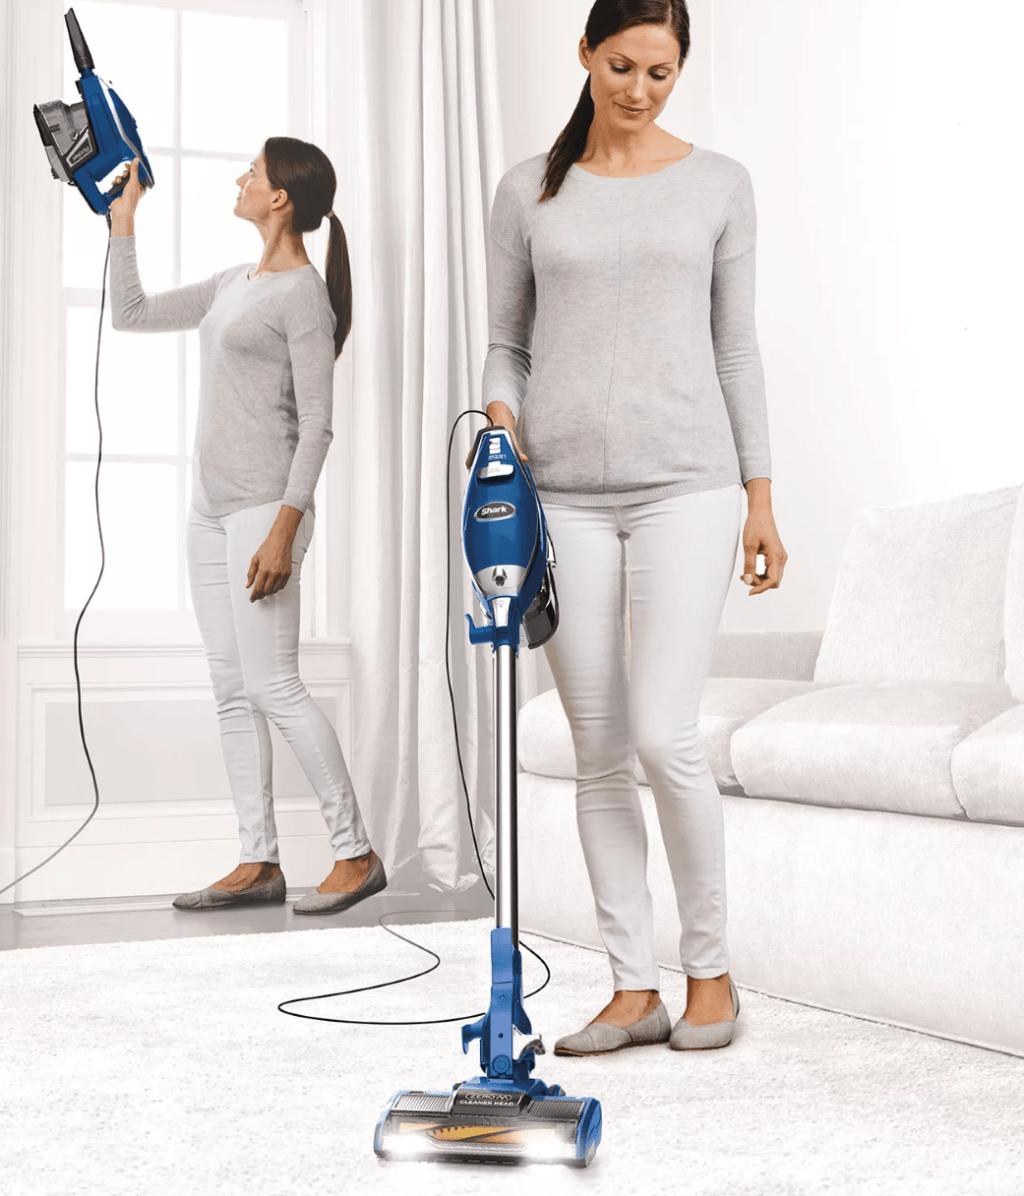 woman vacuuming a room